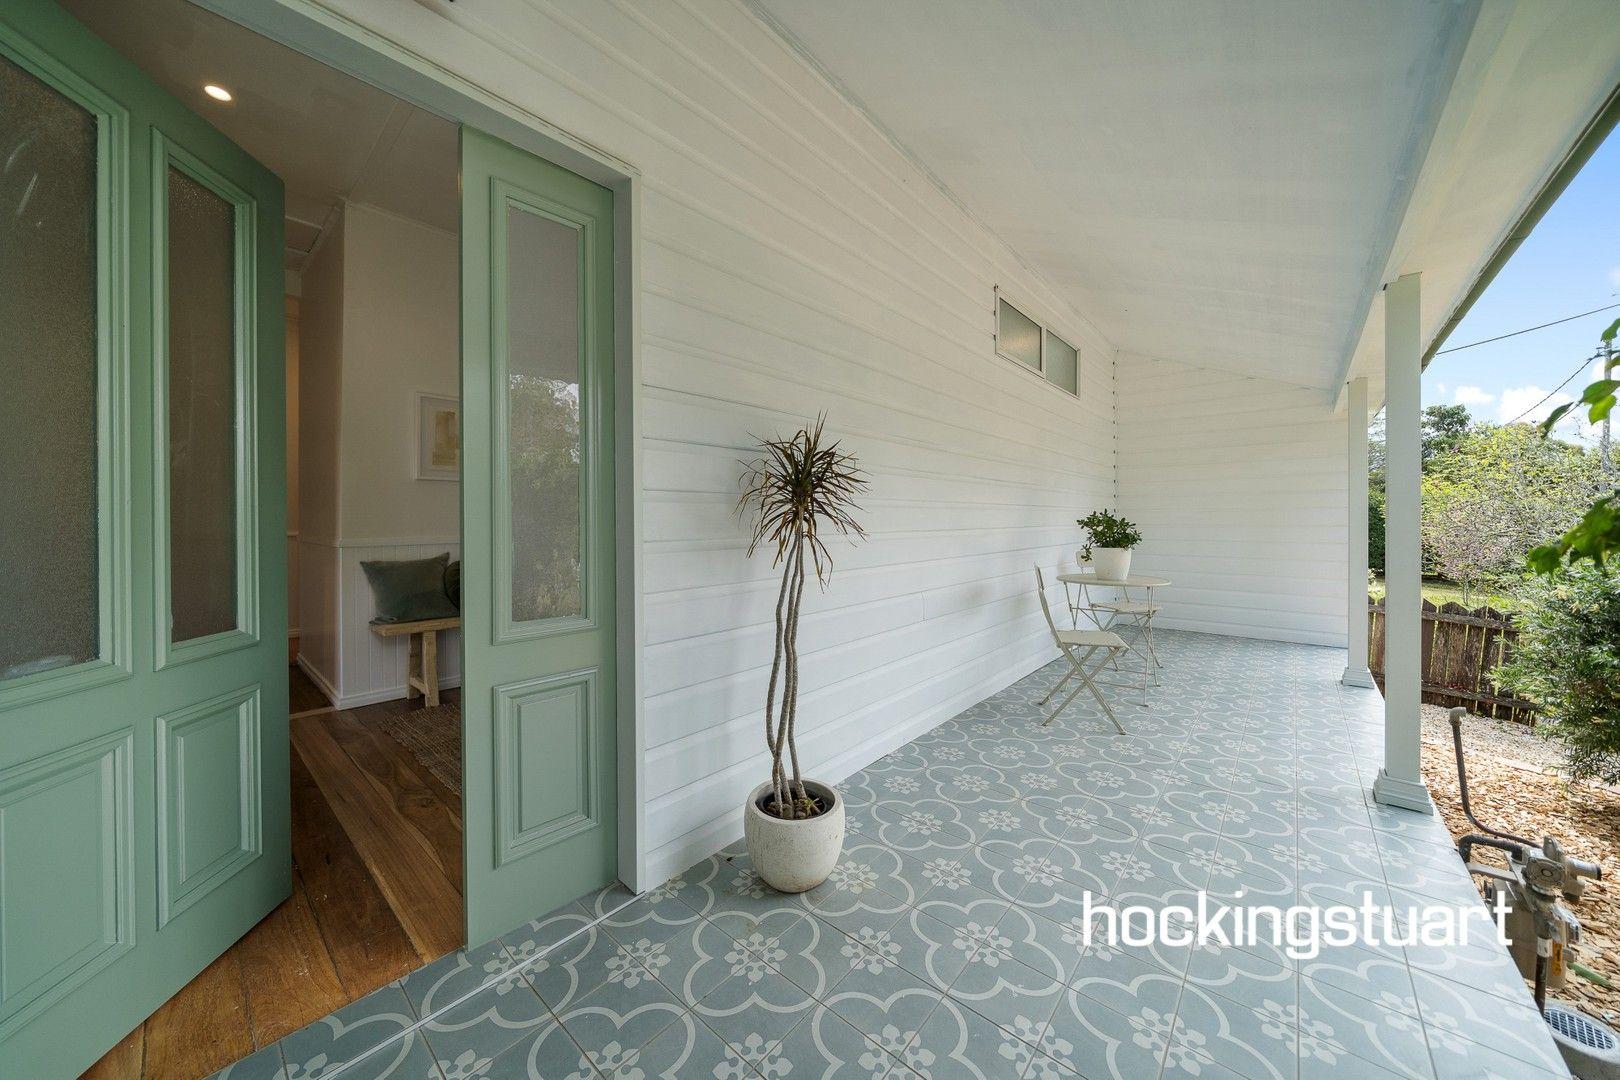 143 Shoalhaven  Street, Nowra NSW 2541, Image 0